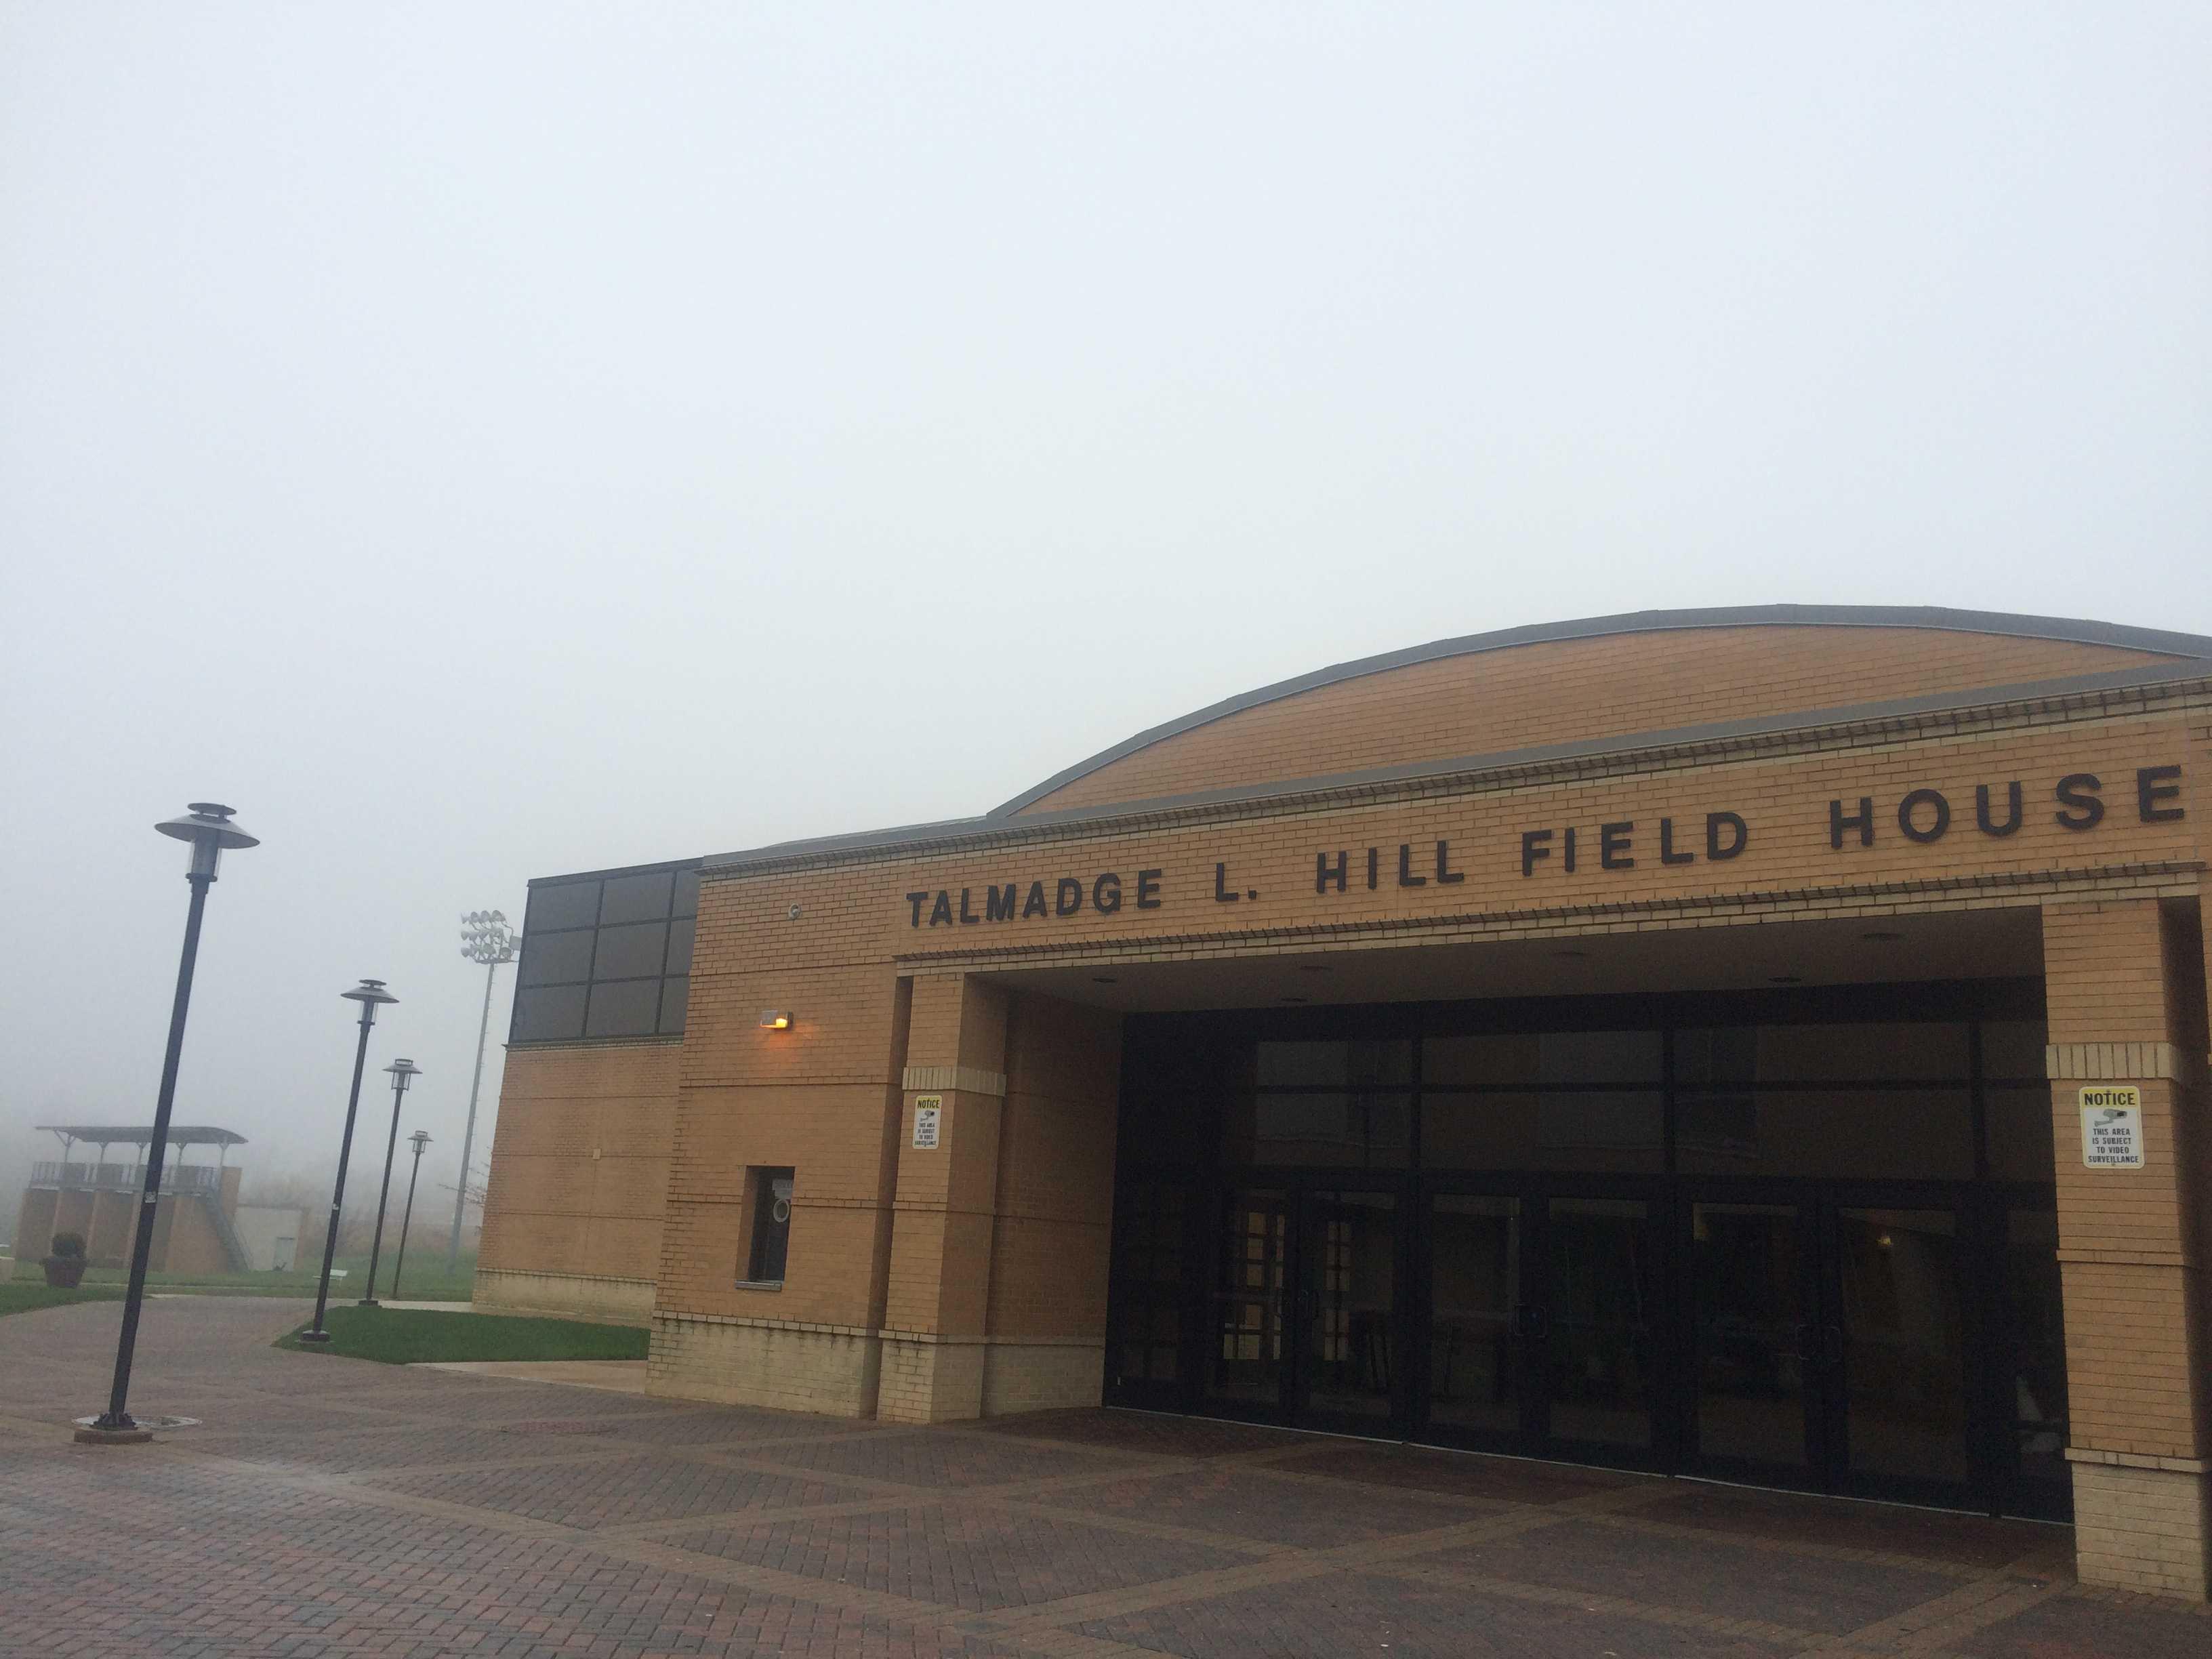 Hill Field House